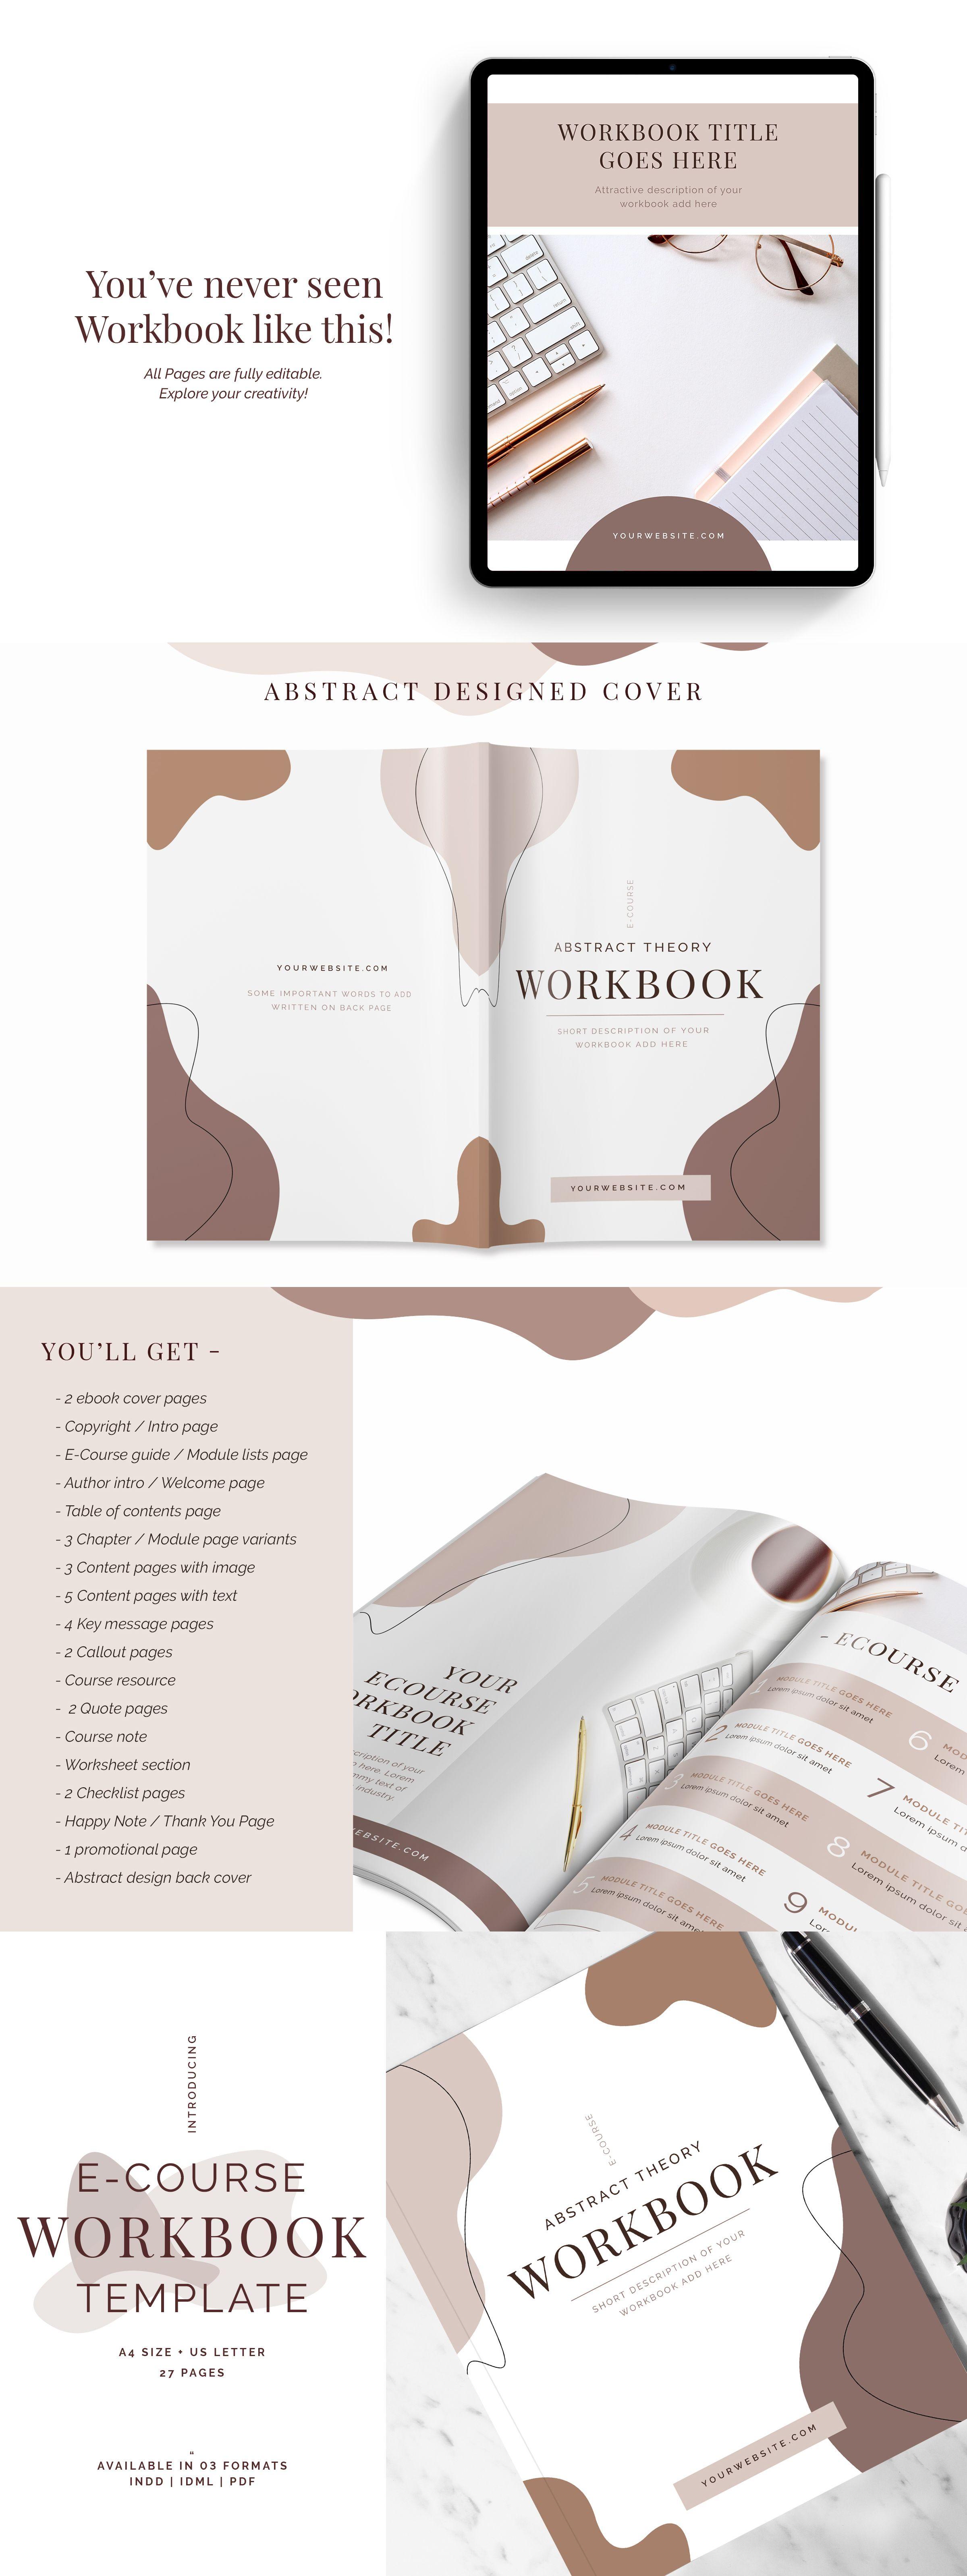 E Course Workbook Template In